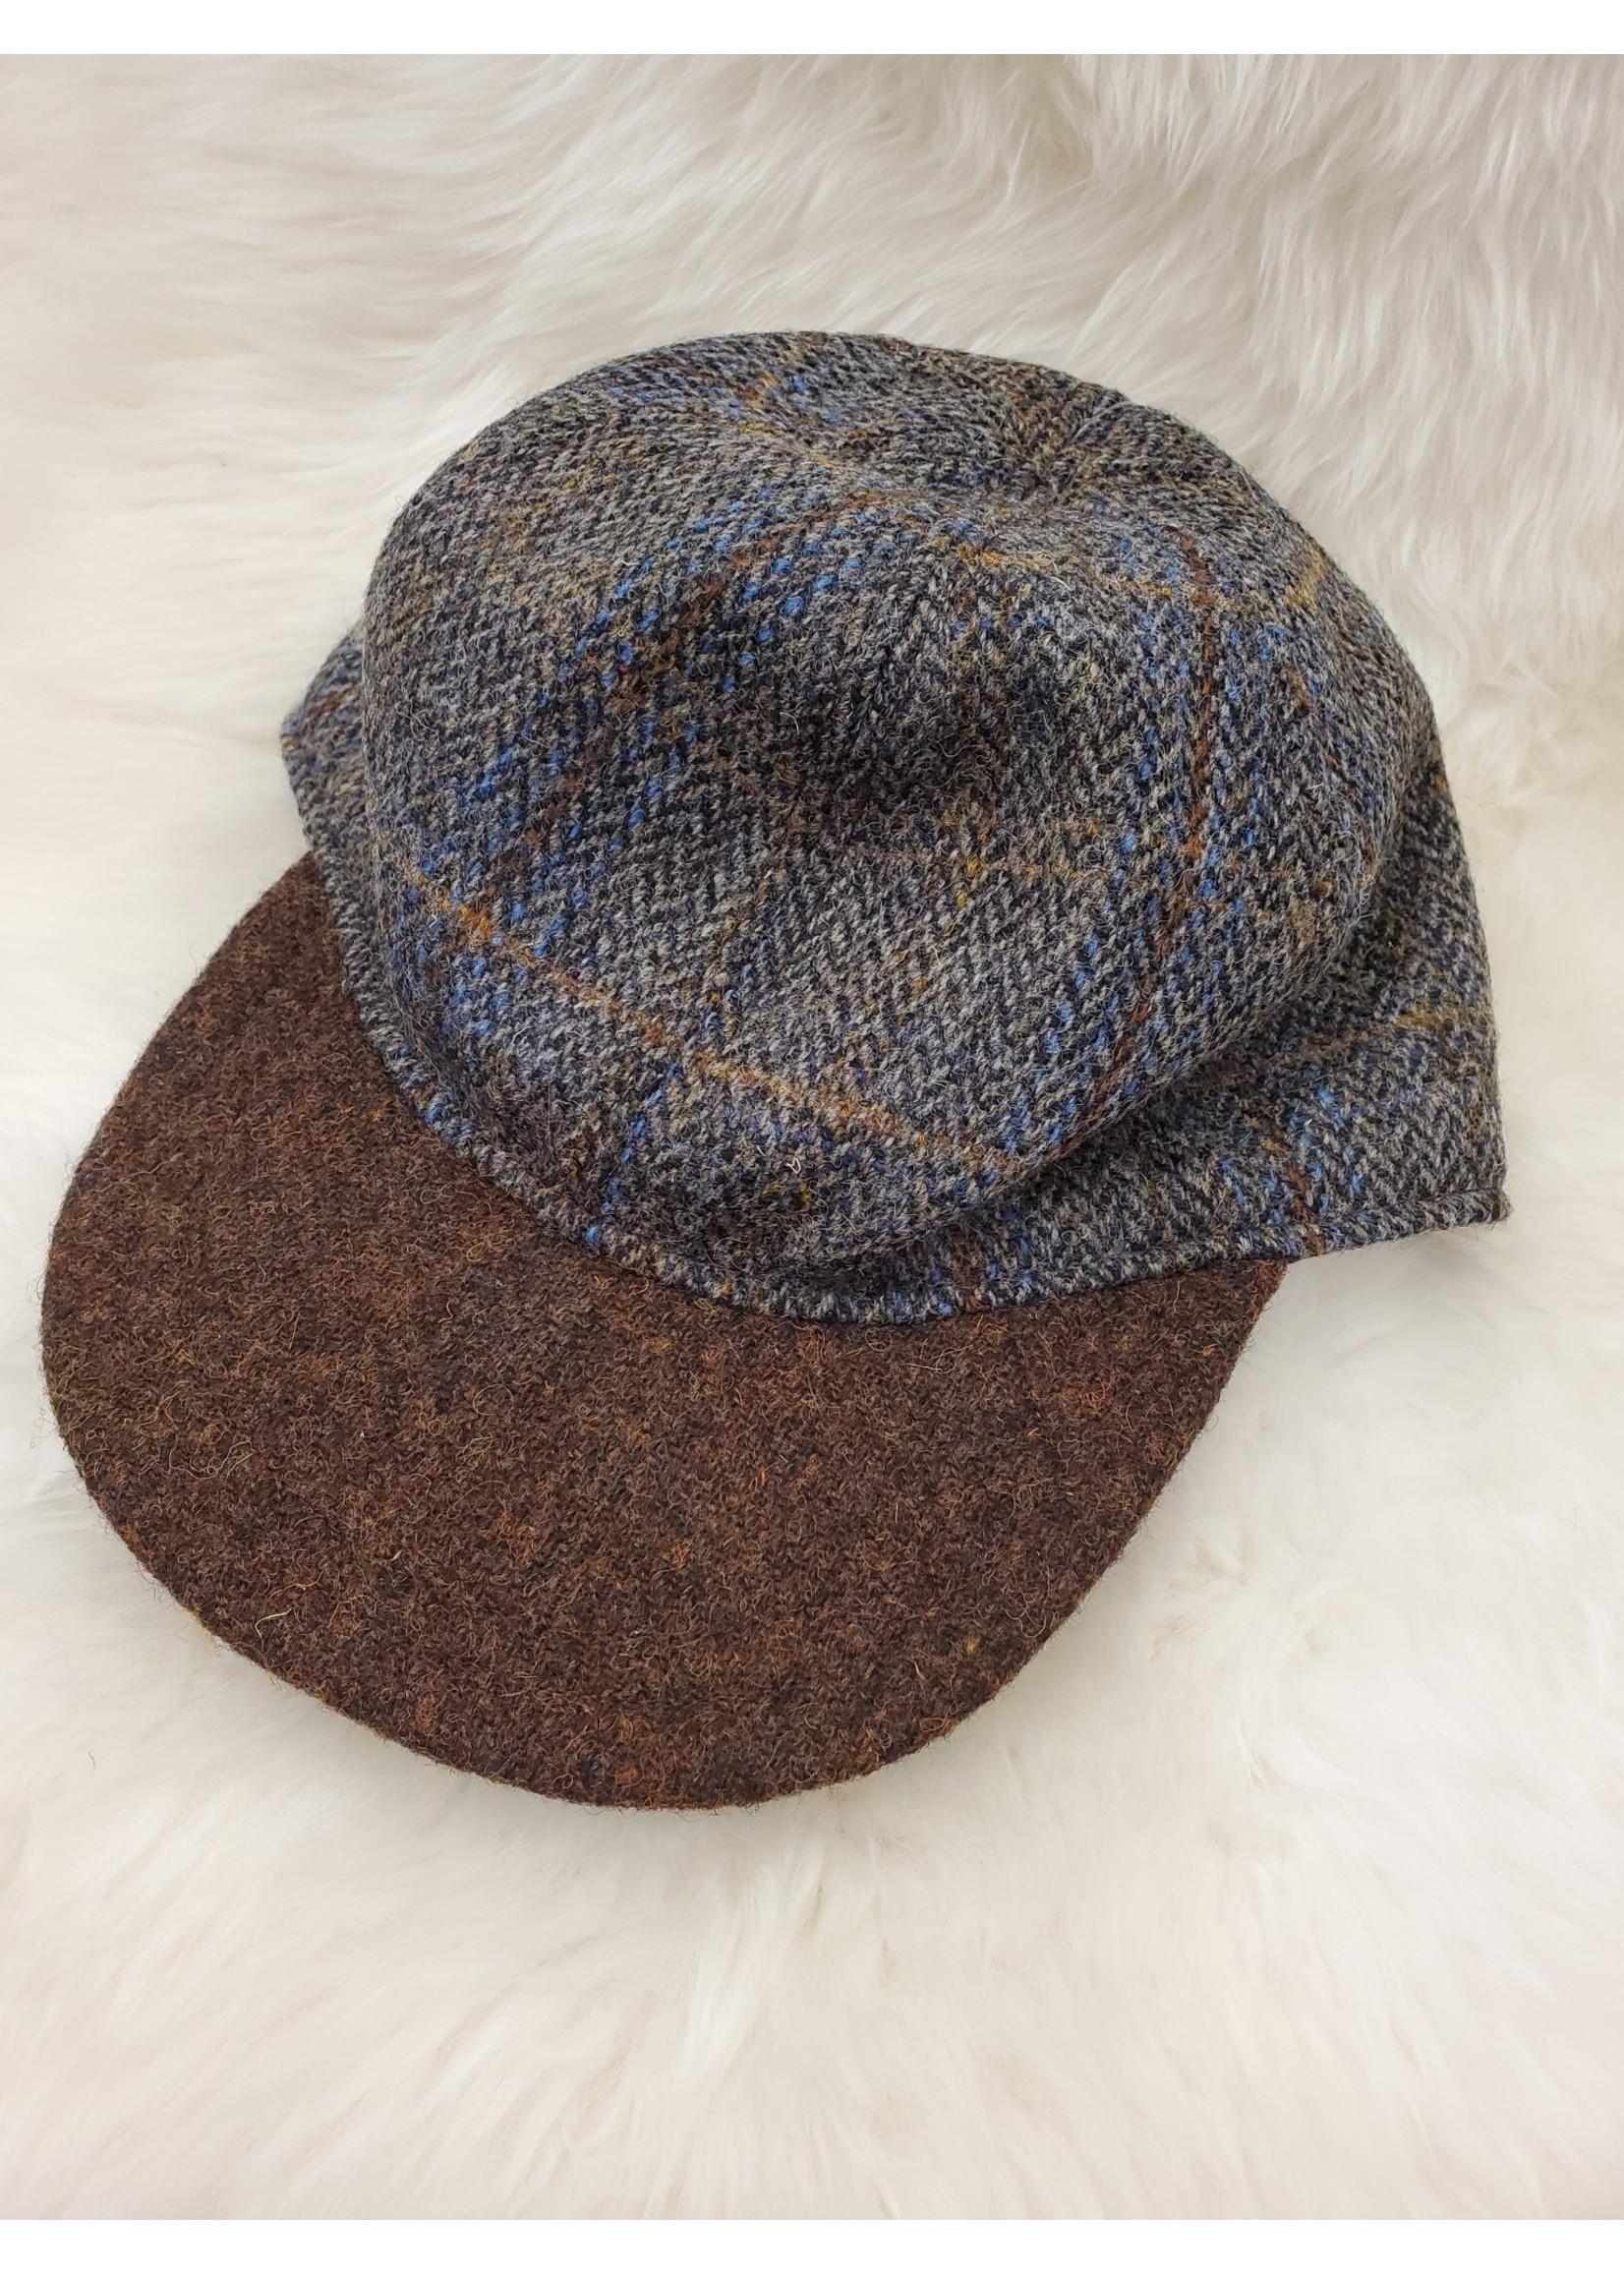 PUFFIN GEAR HARRIS TWEED BALL CAP 19620